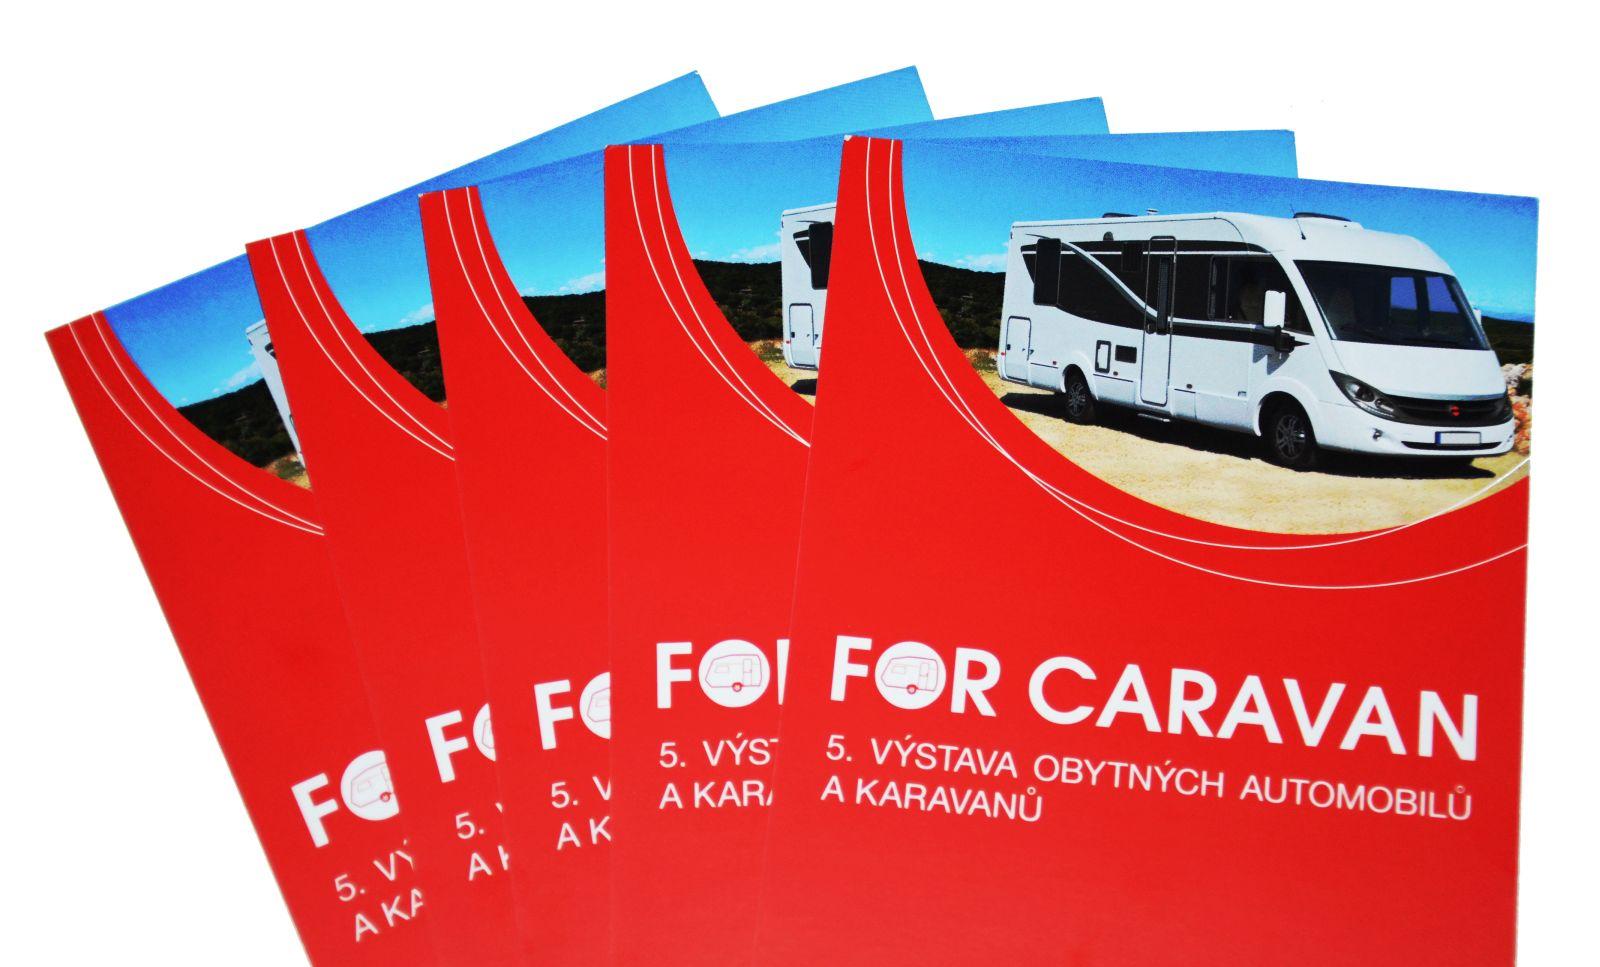 Lístky zdarma na veletrh For Caravan 2014 v Praze